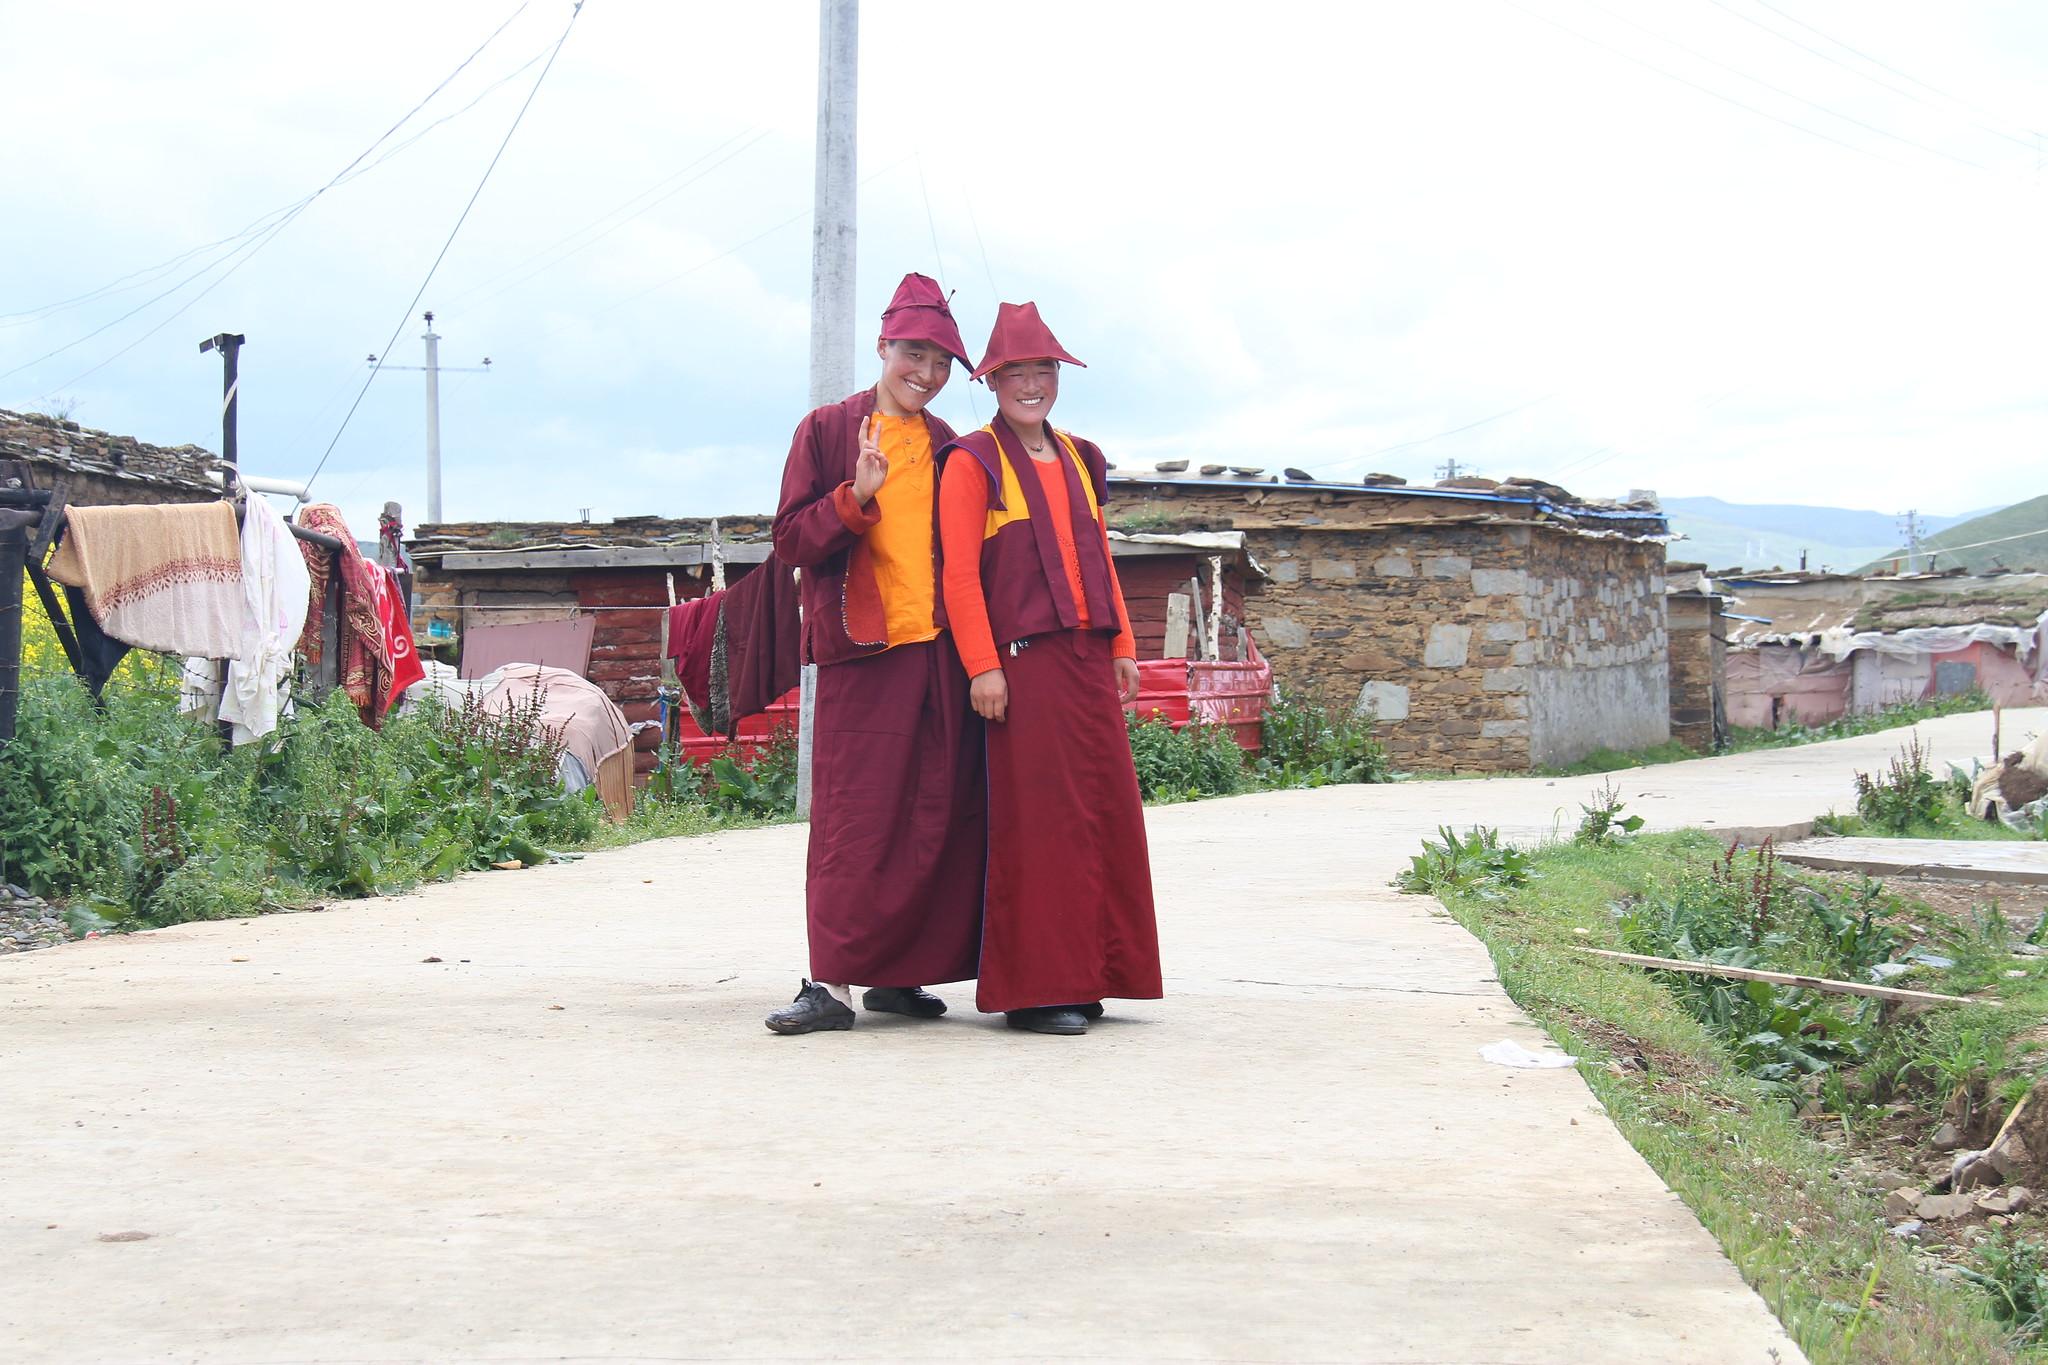 near Tagong, 30/07/2014